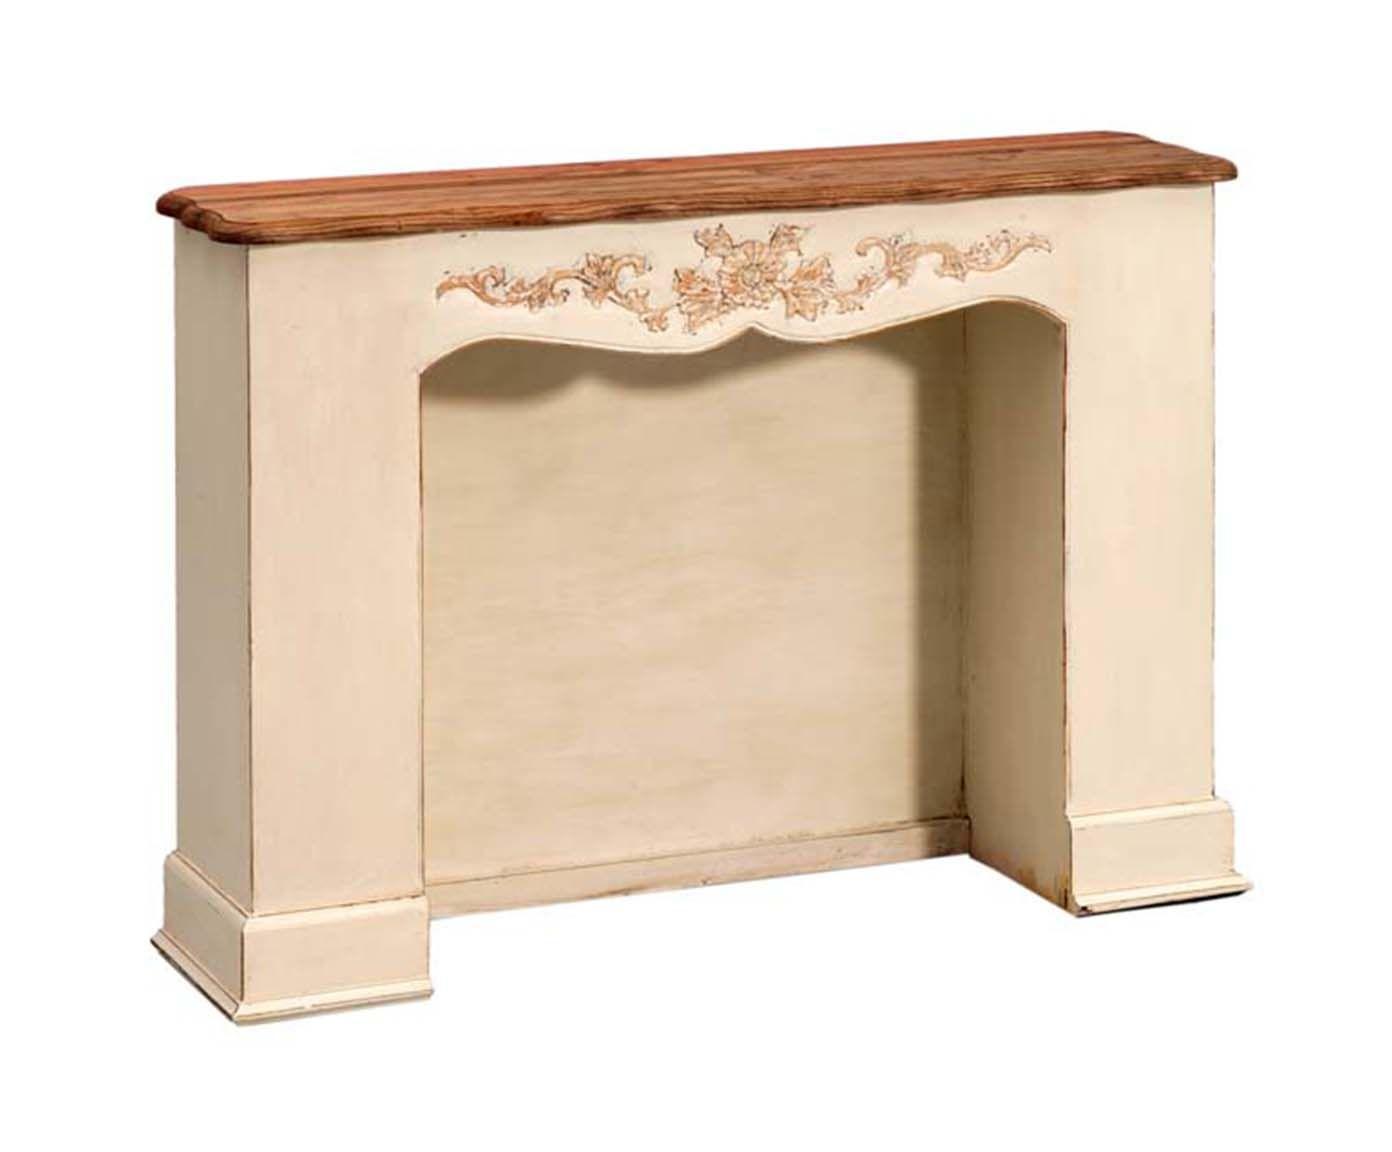 Falsa chimenea furniture meubles pinterest chimenea for Como hacer una chimenea falsa